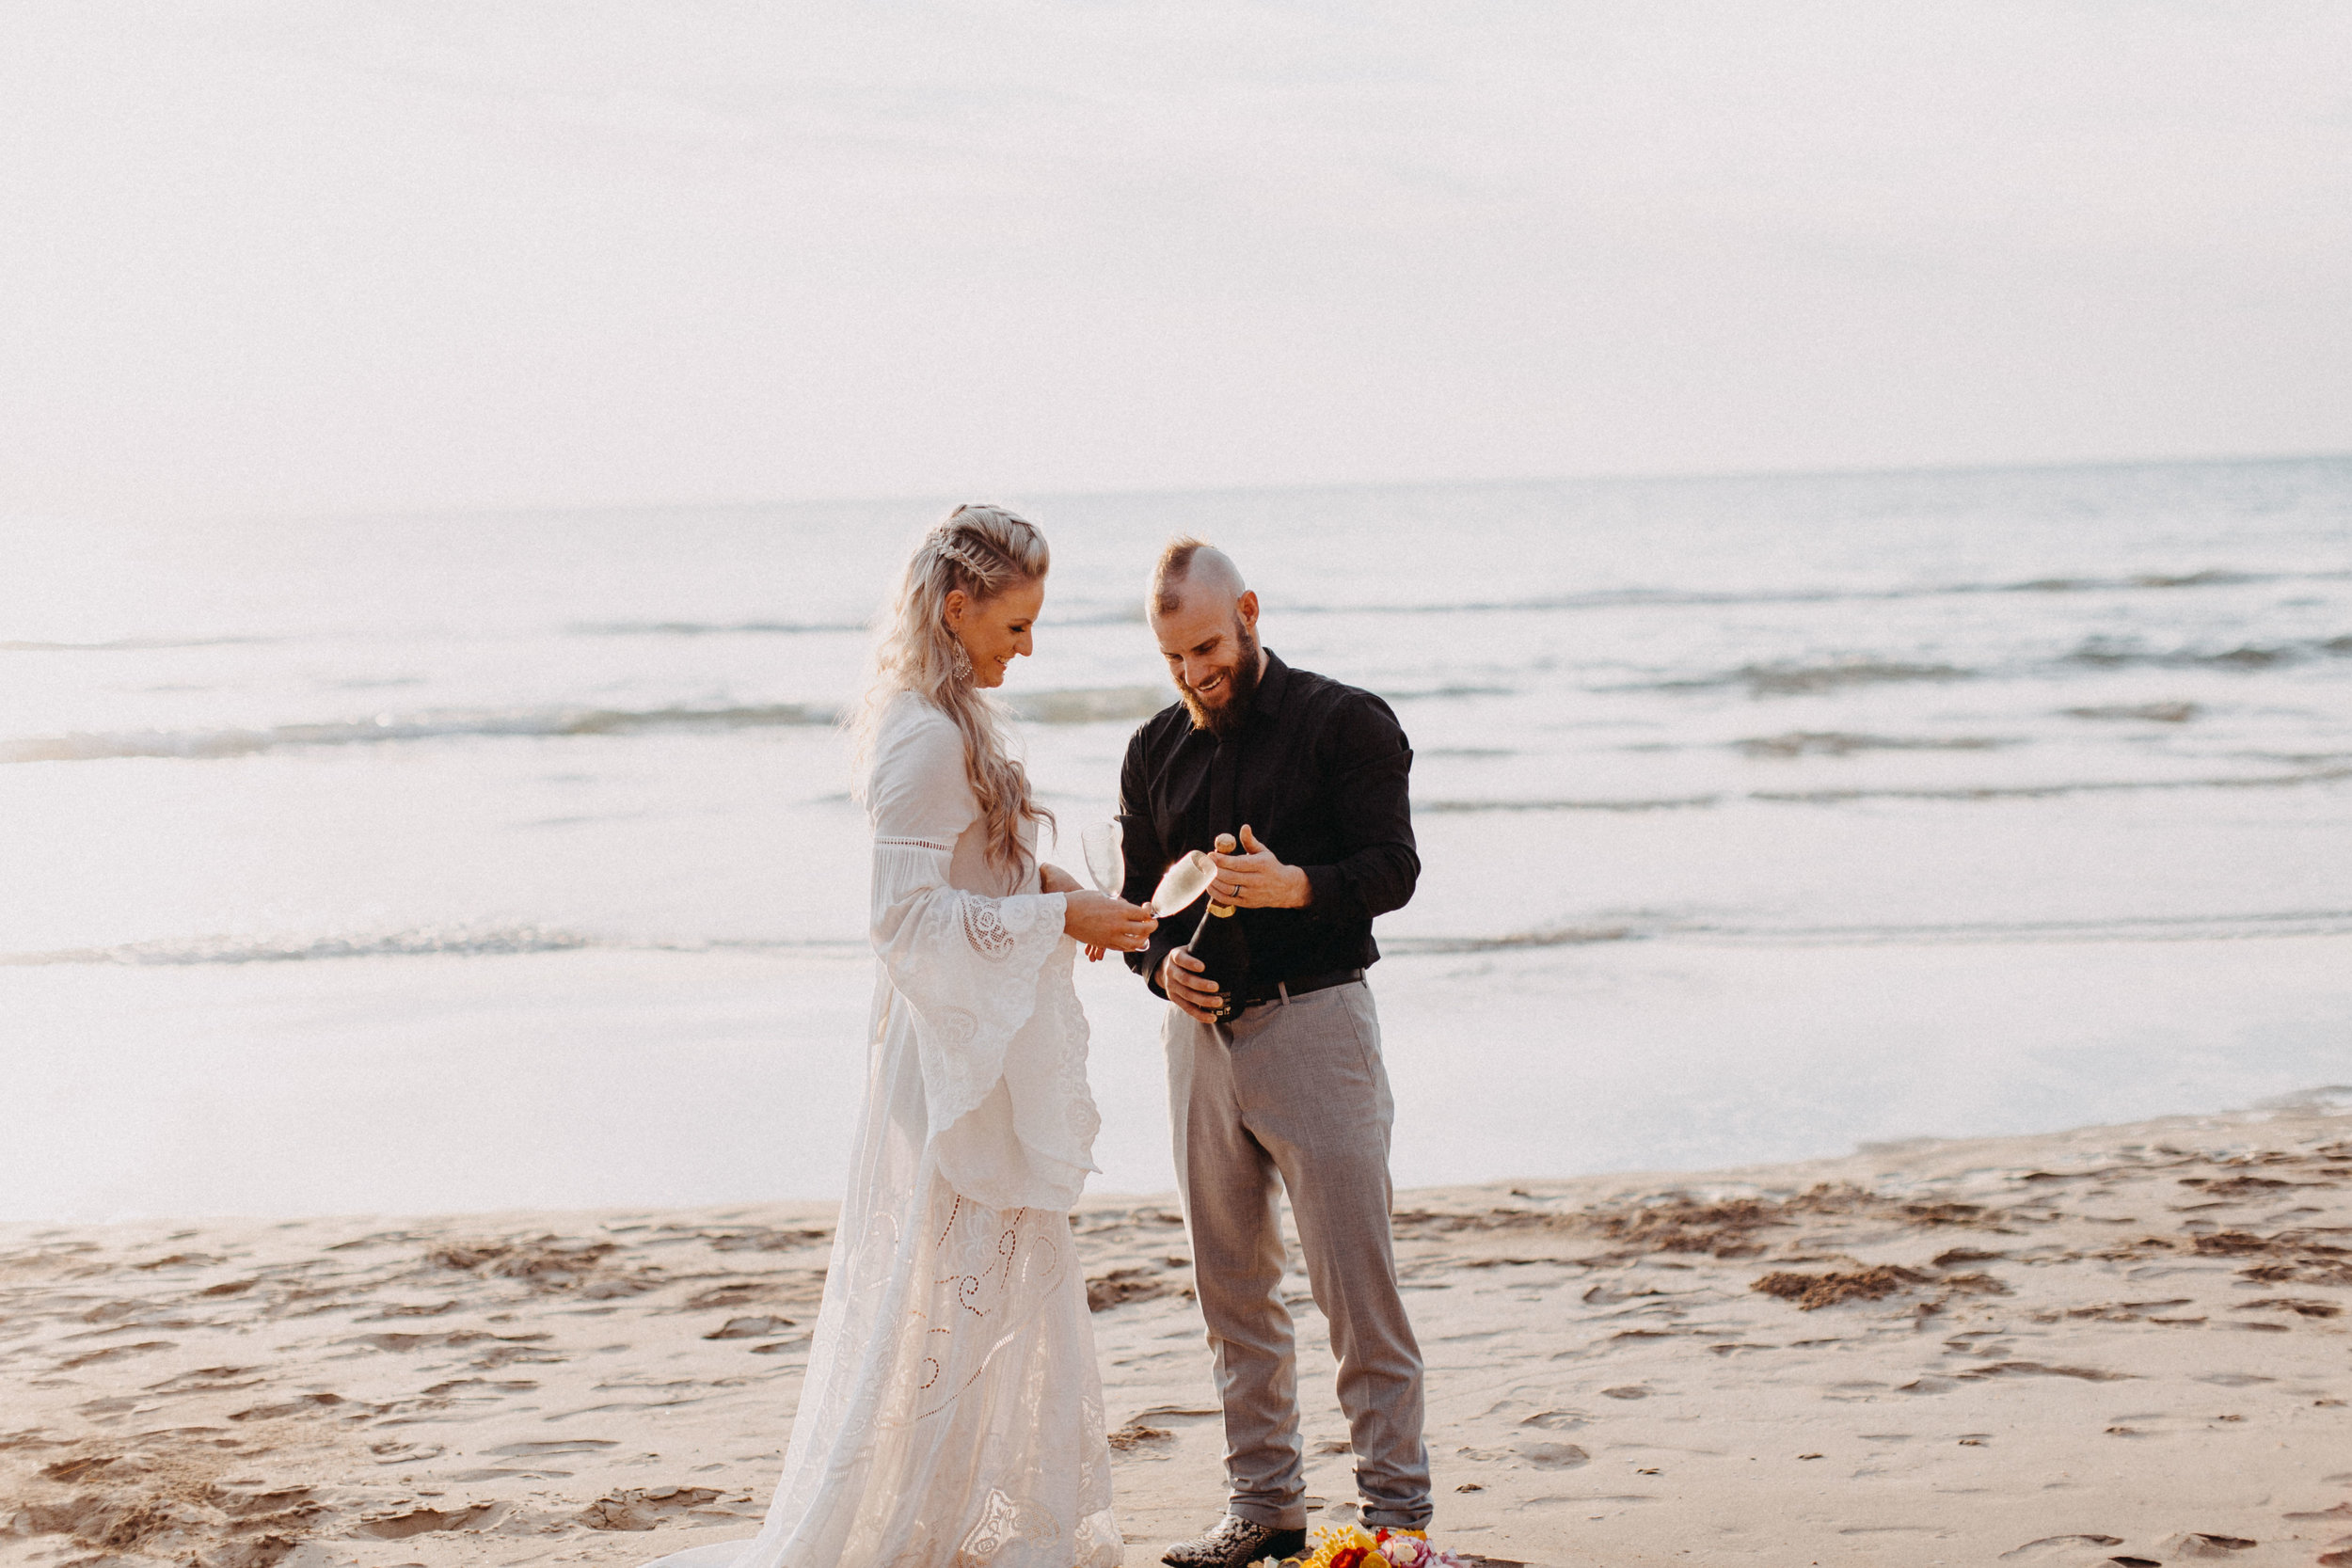 darwin-elopement-wedding-beach-camden-photography-www.emilyobrienphotography.net-62.jpg